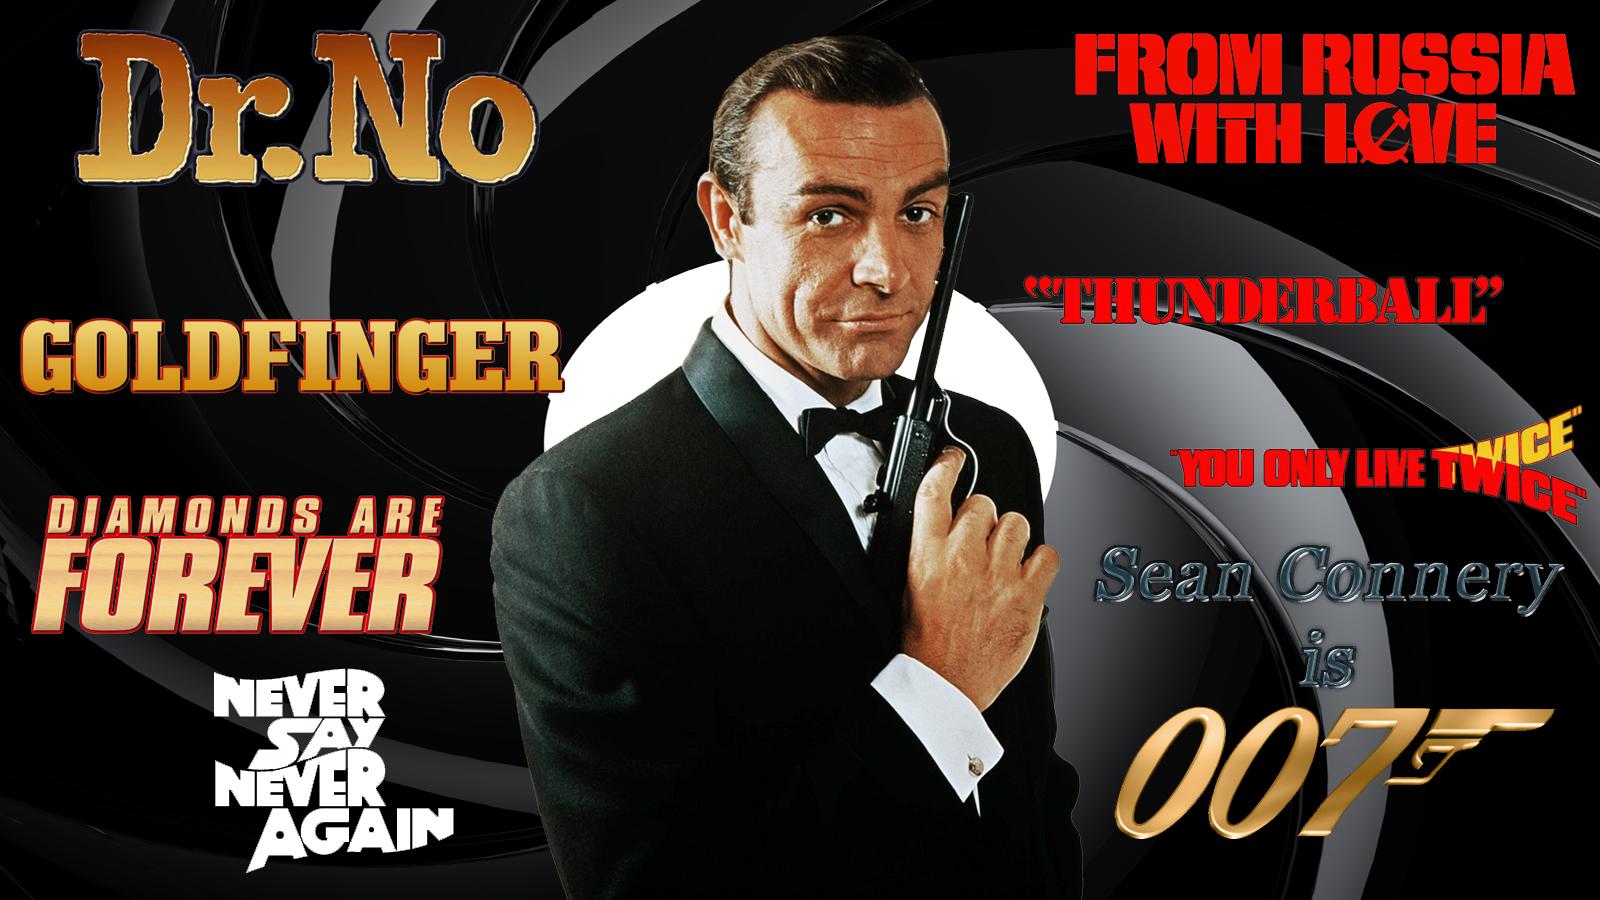 Sean Connery - 007 wp